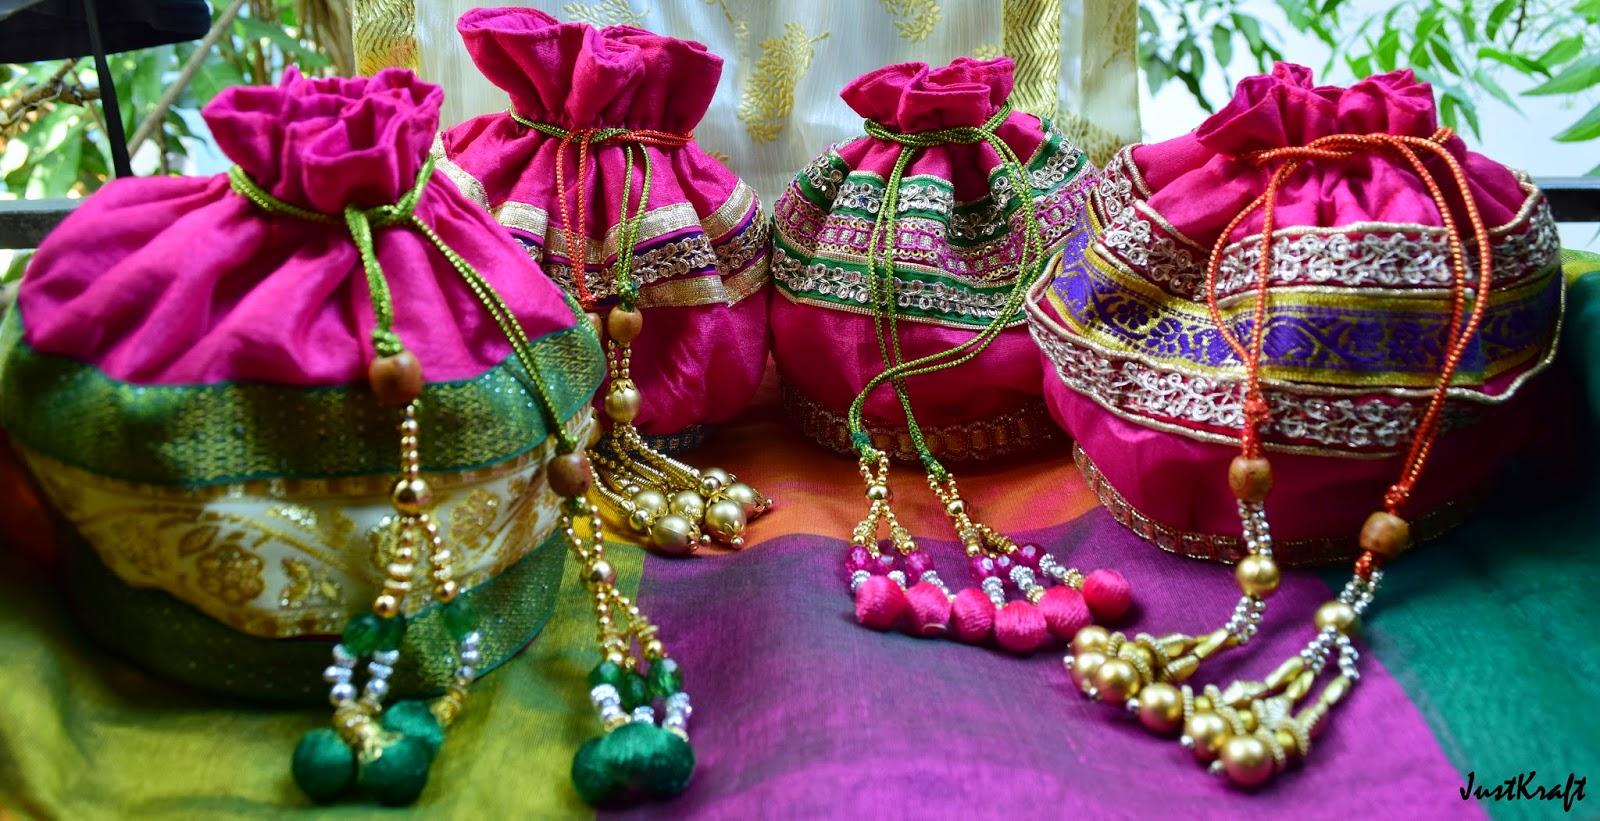 Pink Raw Silk Polti or drawstring bag